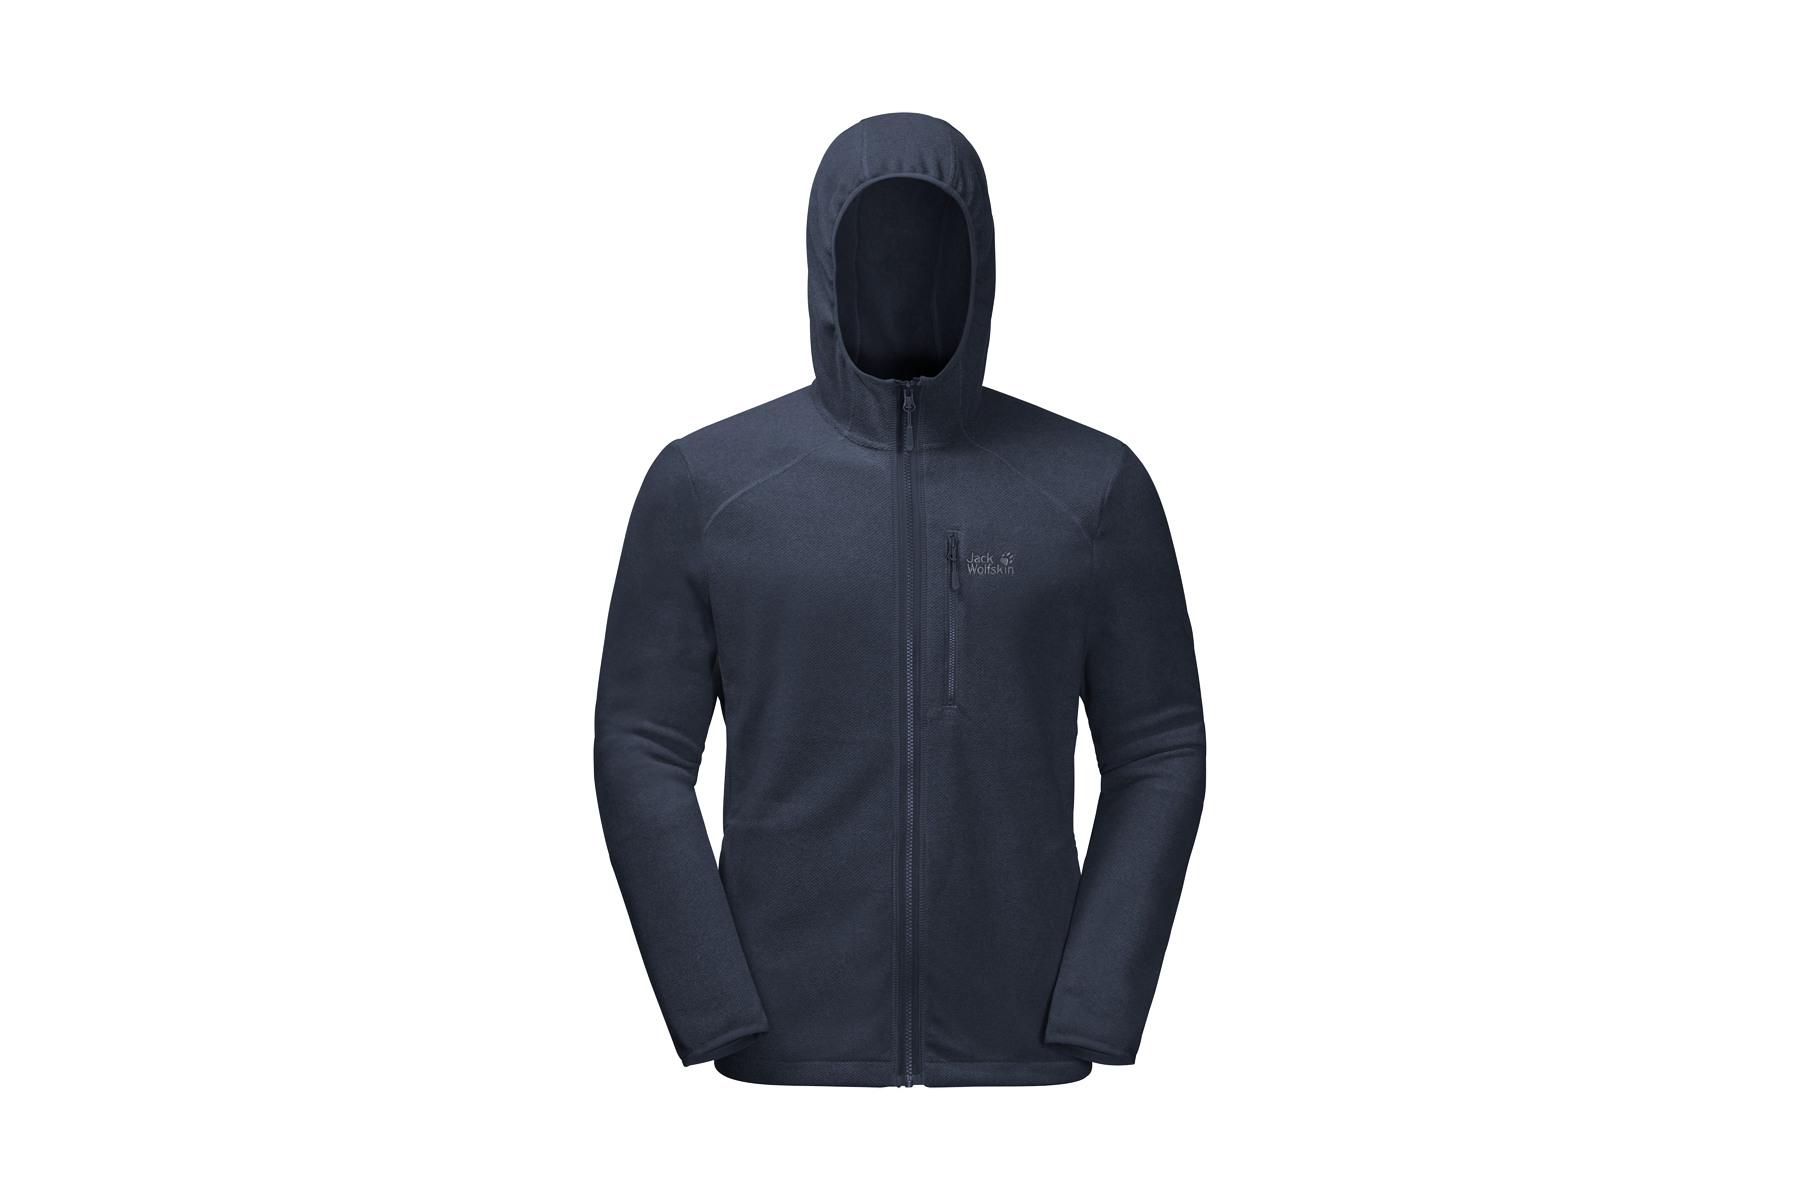 Wolfskin Fleecejacke Jack M Kaufen Hydro Jacket Herren gYf6b7y